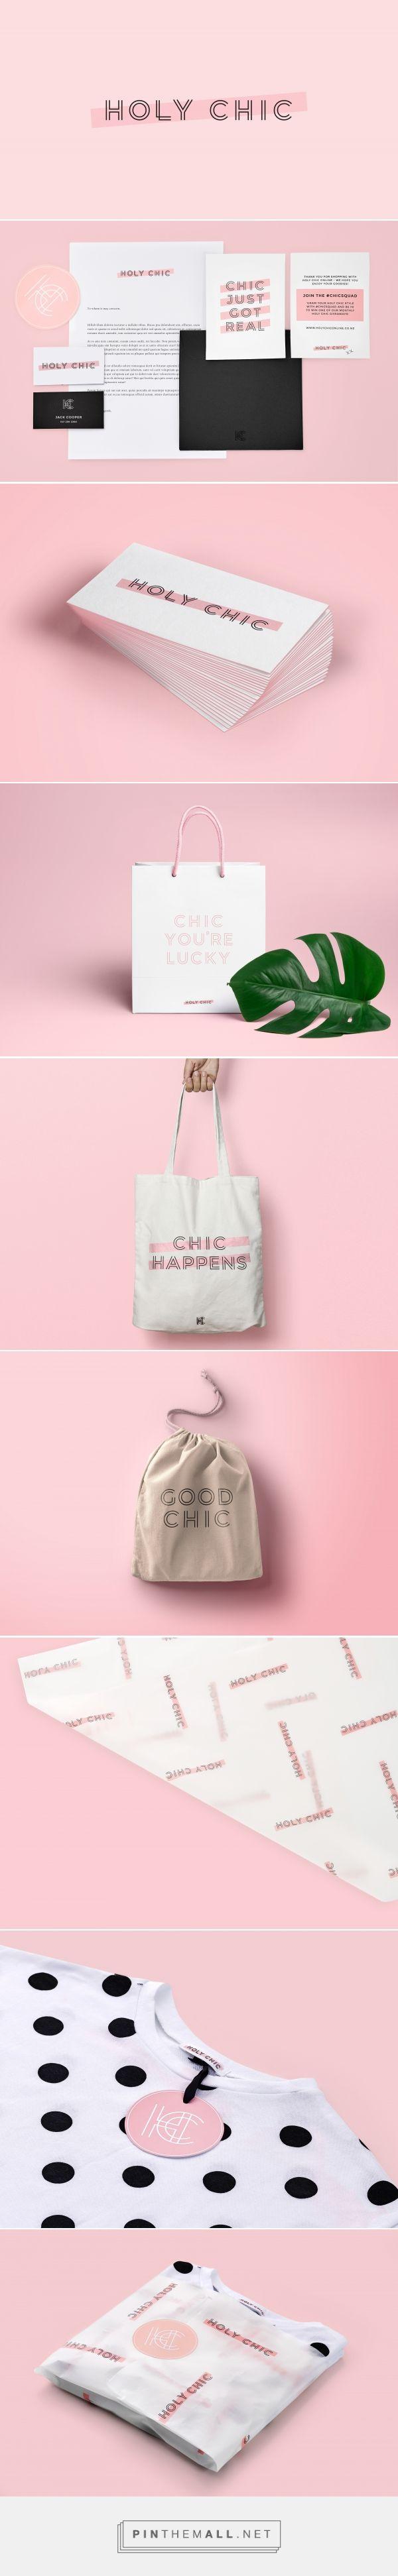 Holy Chic Streetwear Fashion Branding by Hannah Dollery